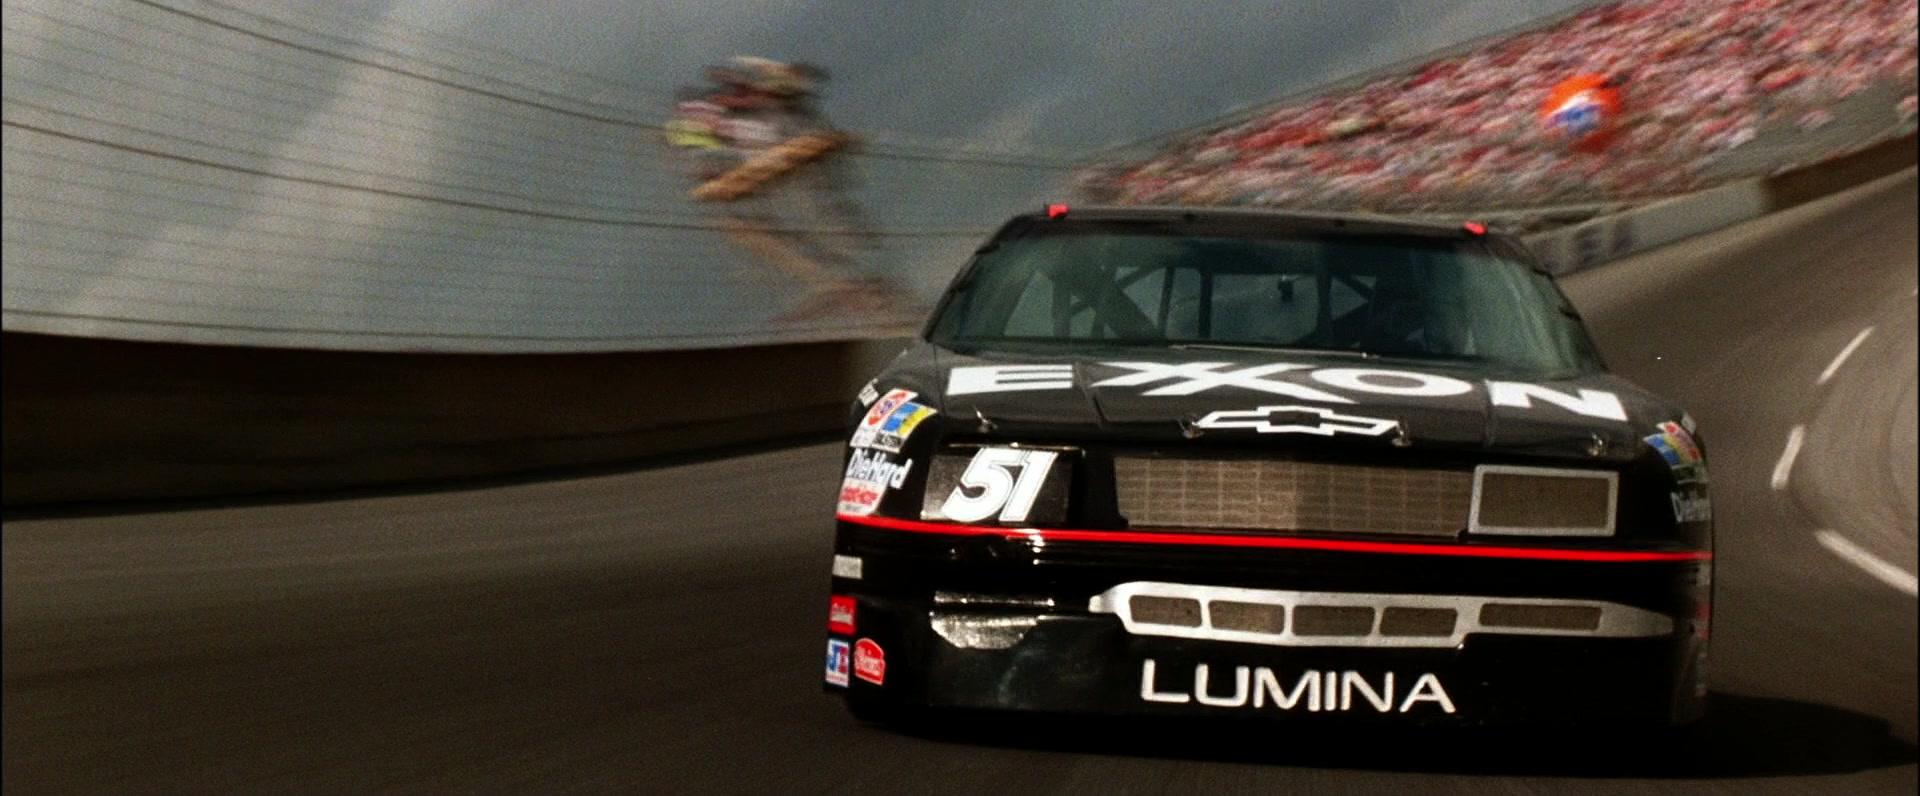 Used Corvette Stingray >> Exxon, Chevrolet, Lumina in Days of Thunder (1990) Movie